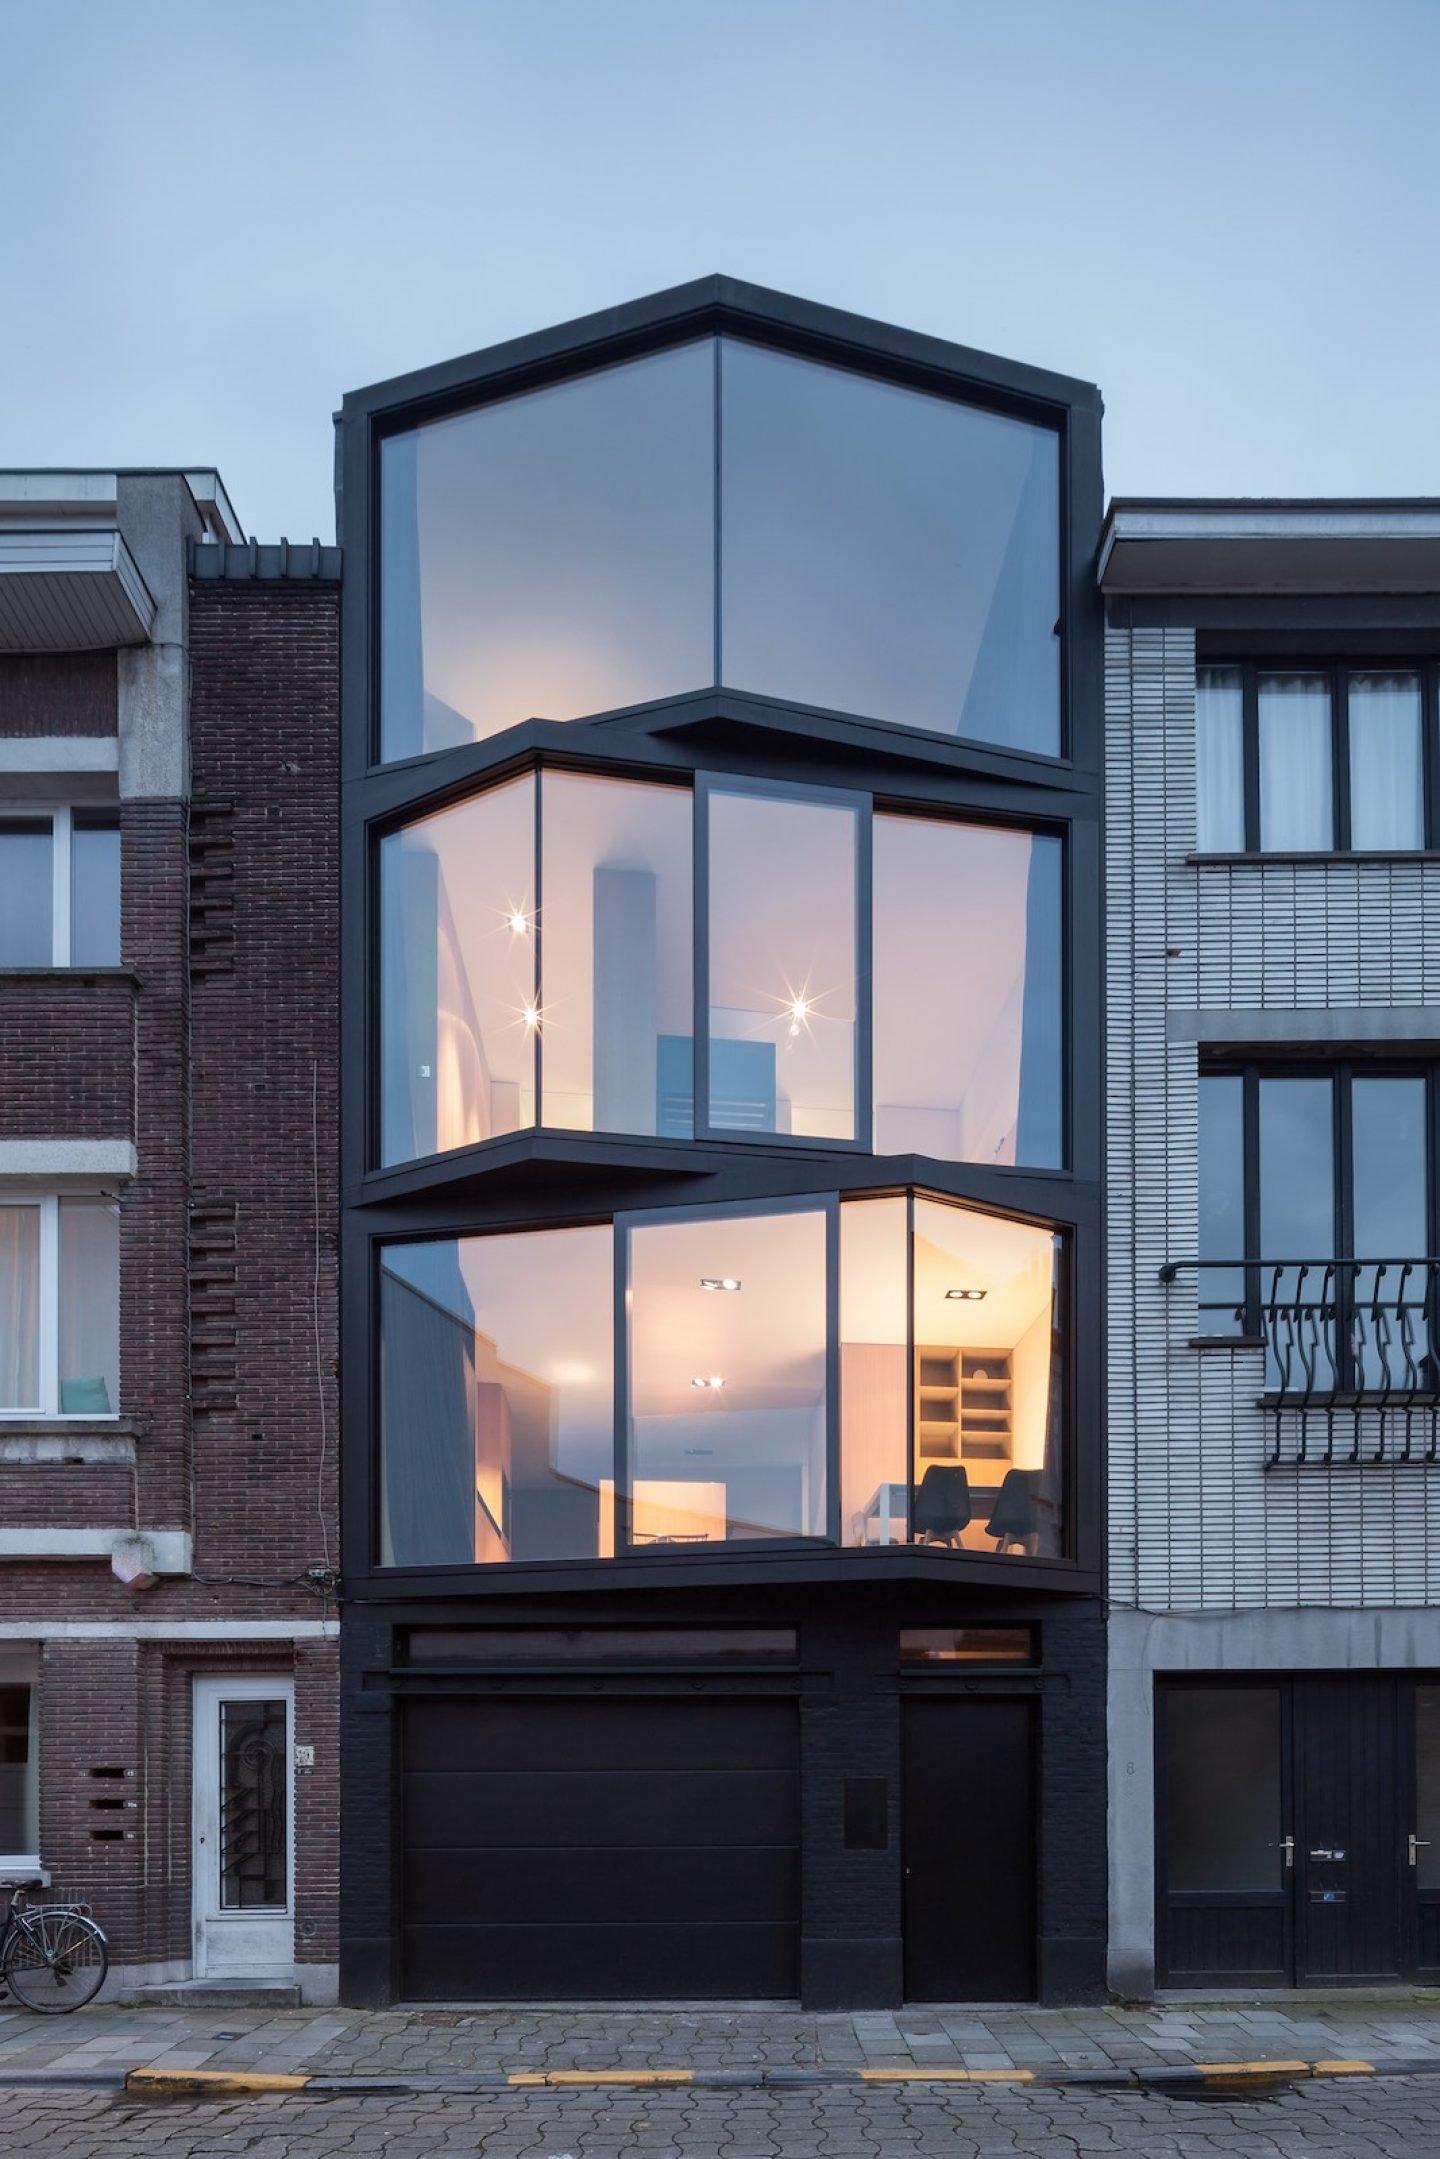 Architecture_AbeelHouse_StevenVandenborre_MiassArchitecture_25